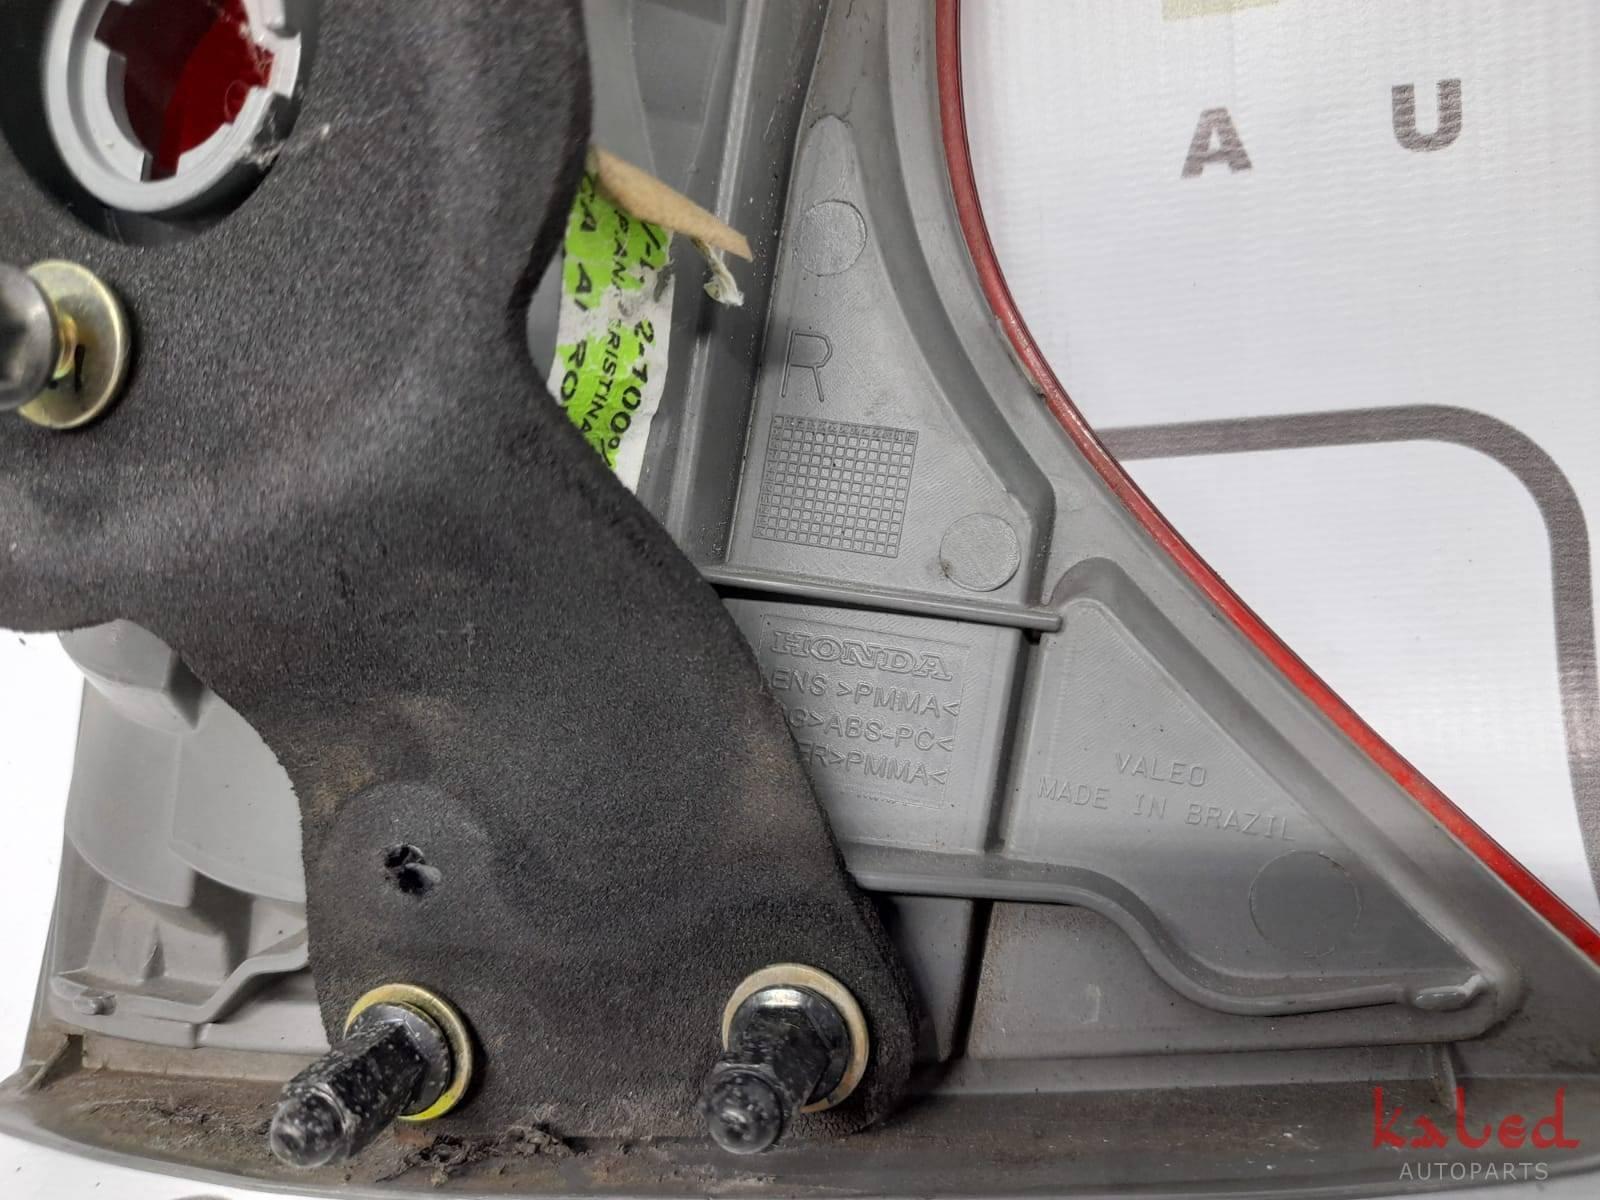 Lanterna Direita Honda New Civic original - Kaled Auto Parts